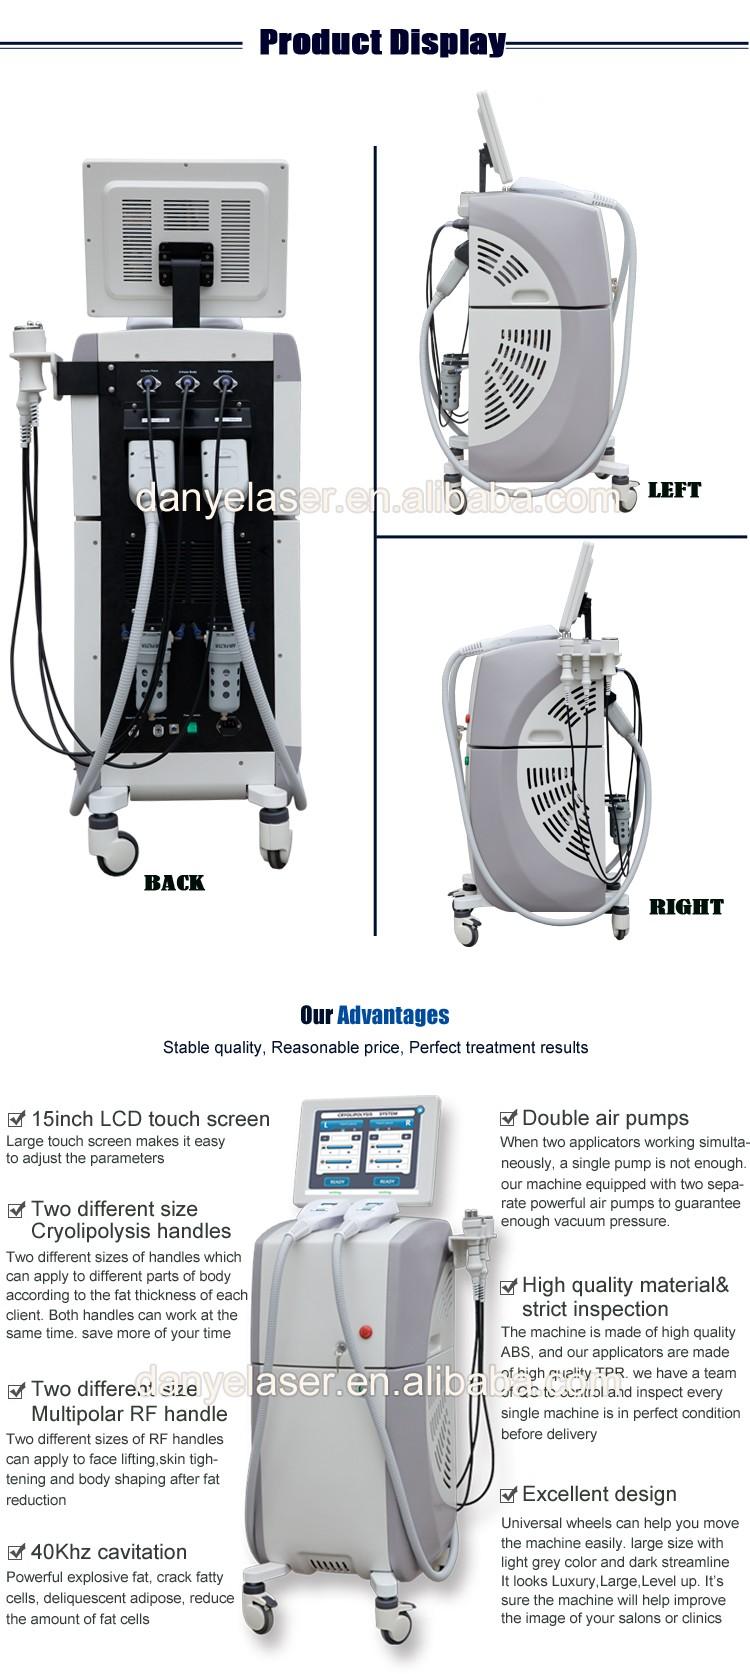 2017 New Technology Cryo Vacuum Ultrasonic Cavitation Rf 4